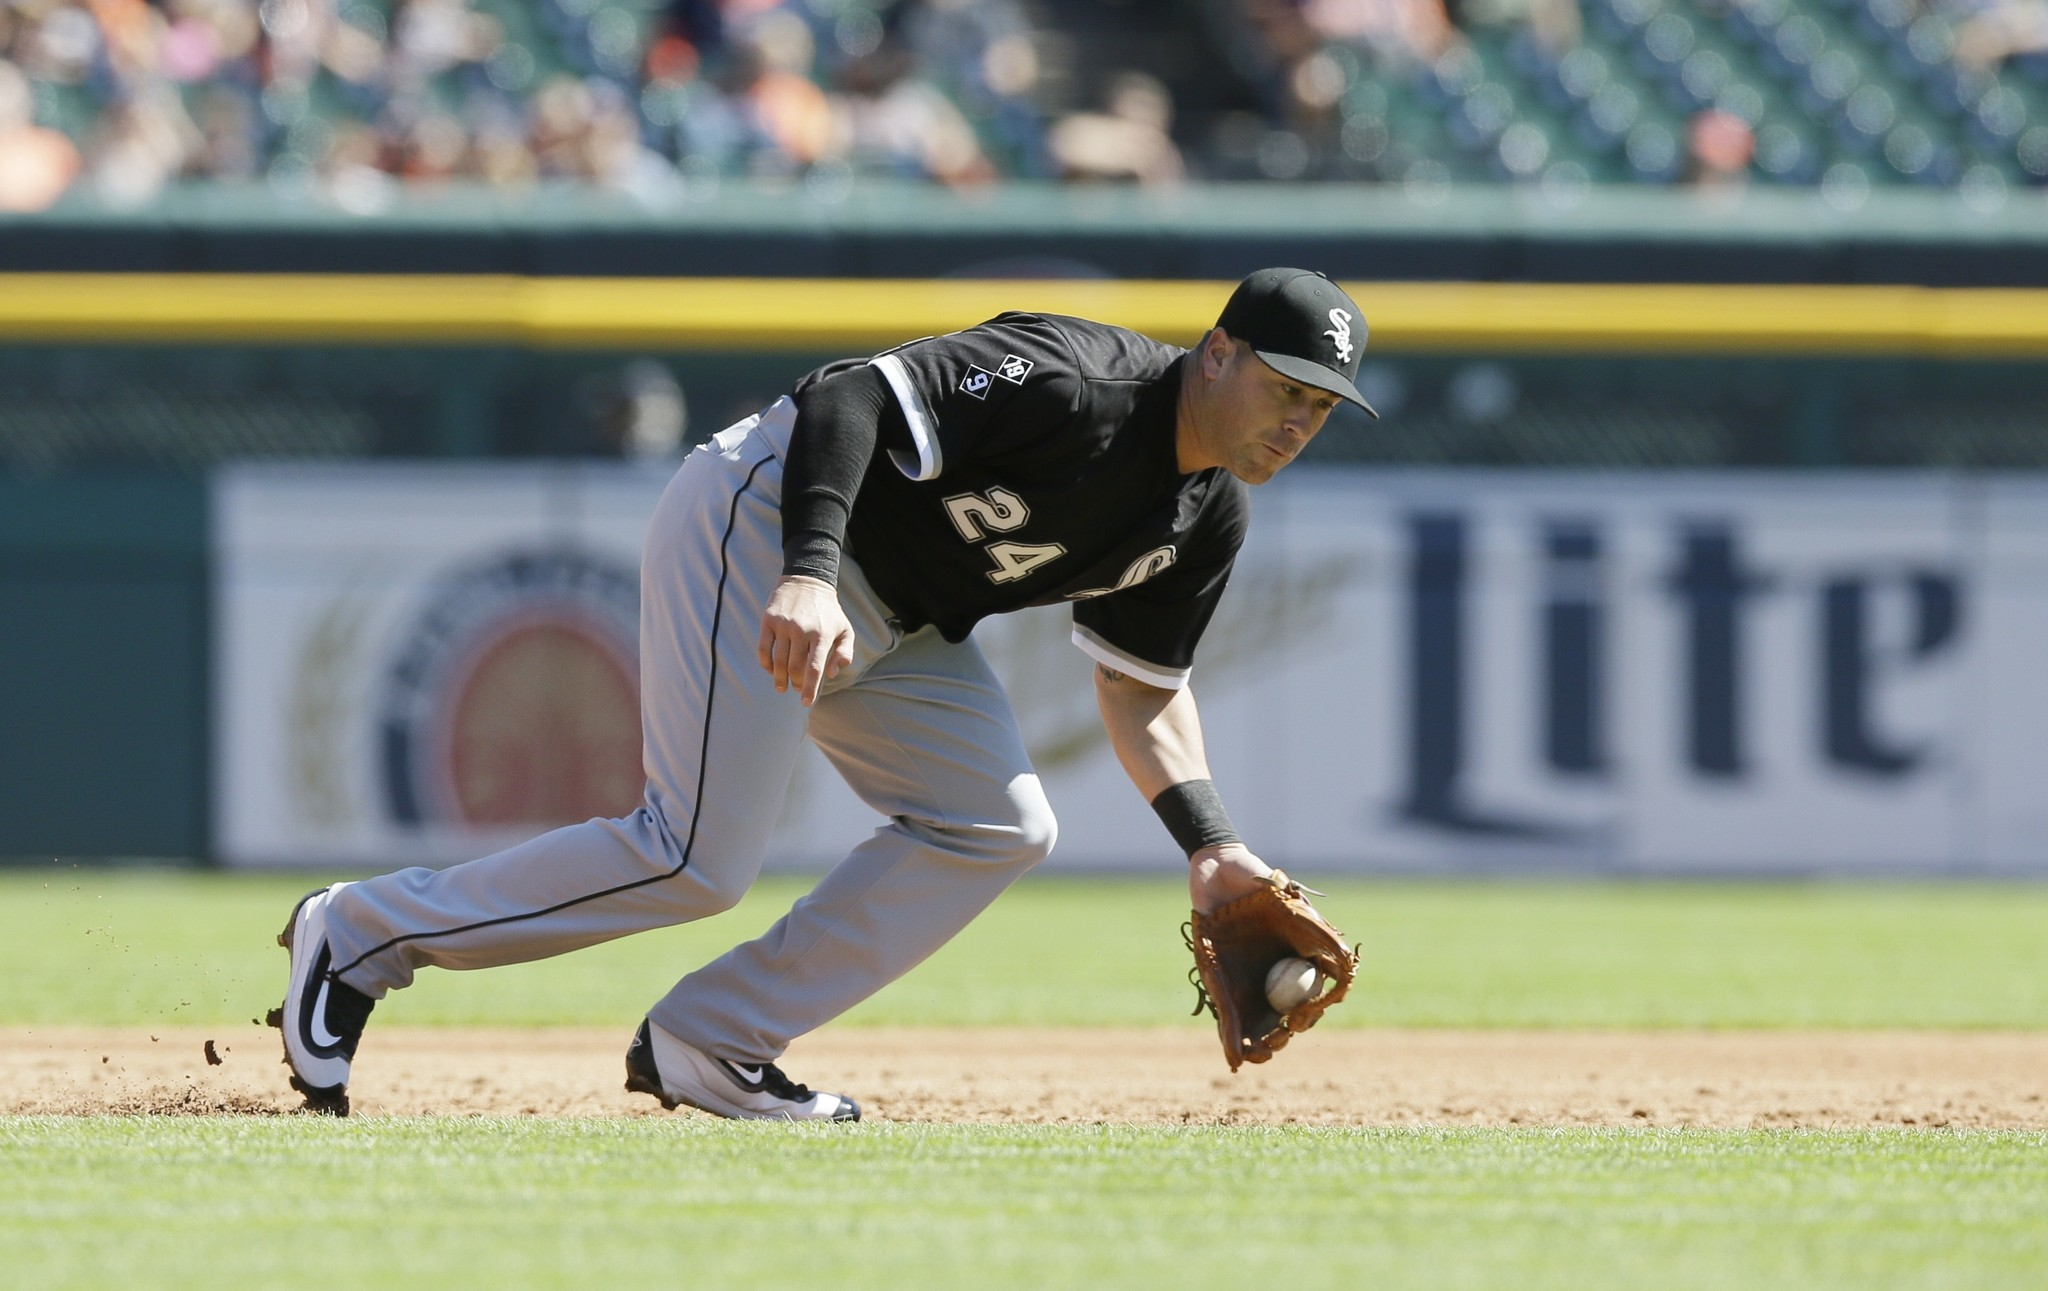 Balls Mike Olt Texas Rangers Top Prospect Signed Autographed Baseball Ball